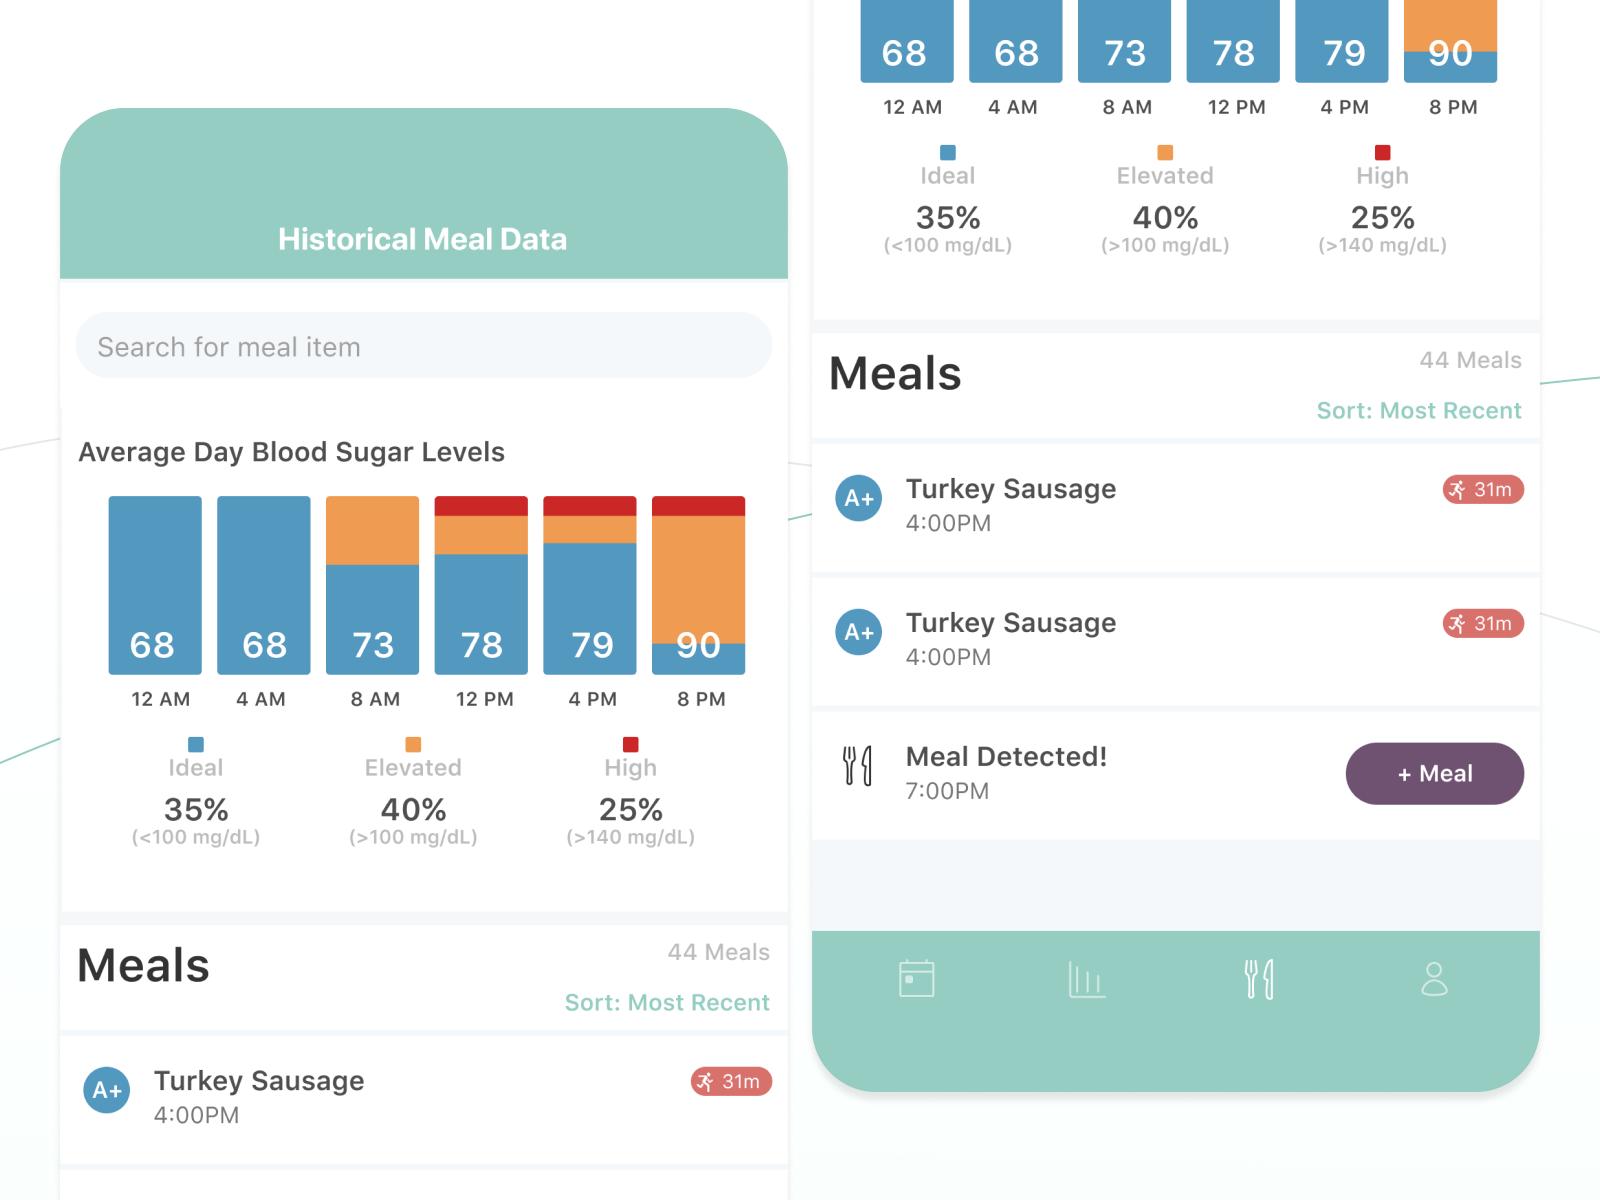 Bgm historical meal data